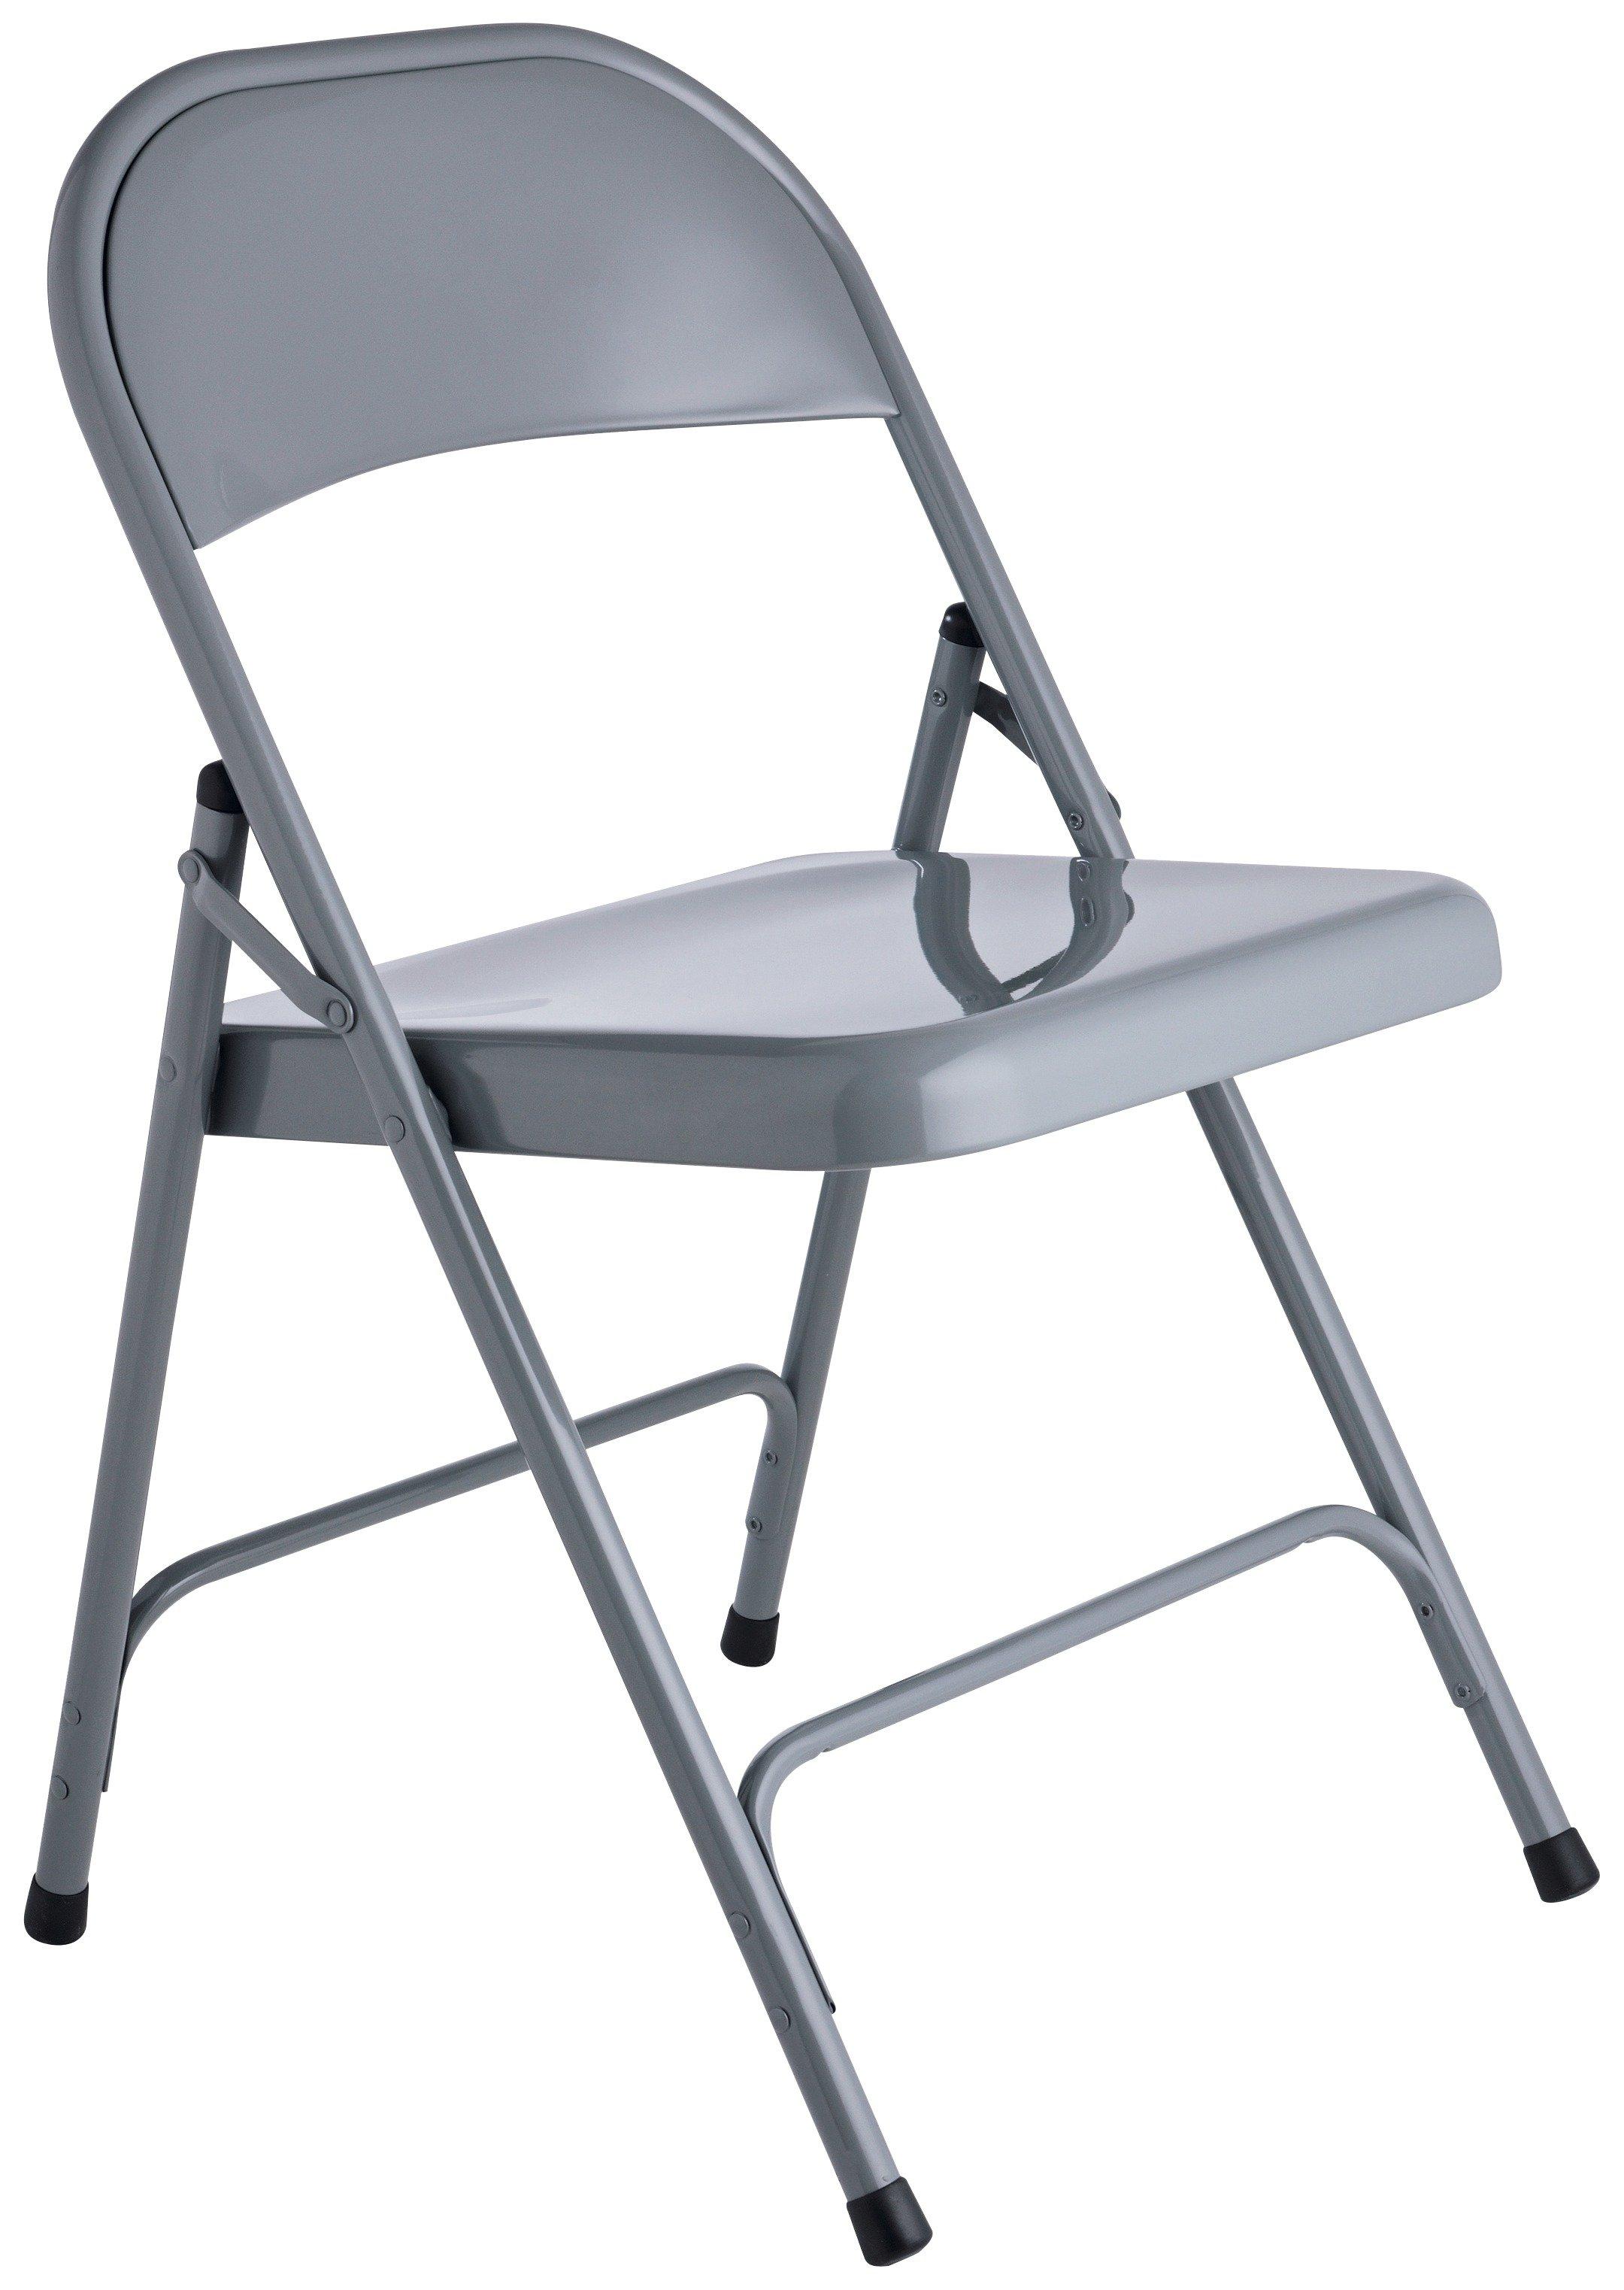 buy habitat macadam metal folding chair - grey at argos.co.uk